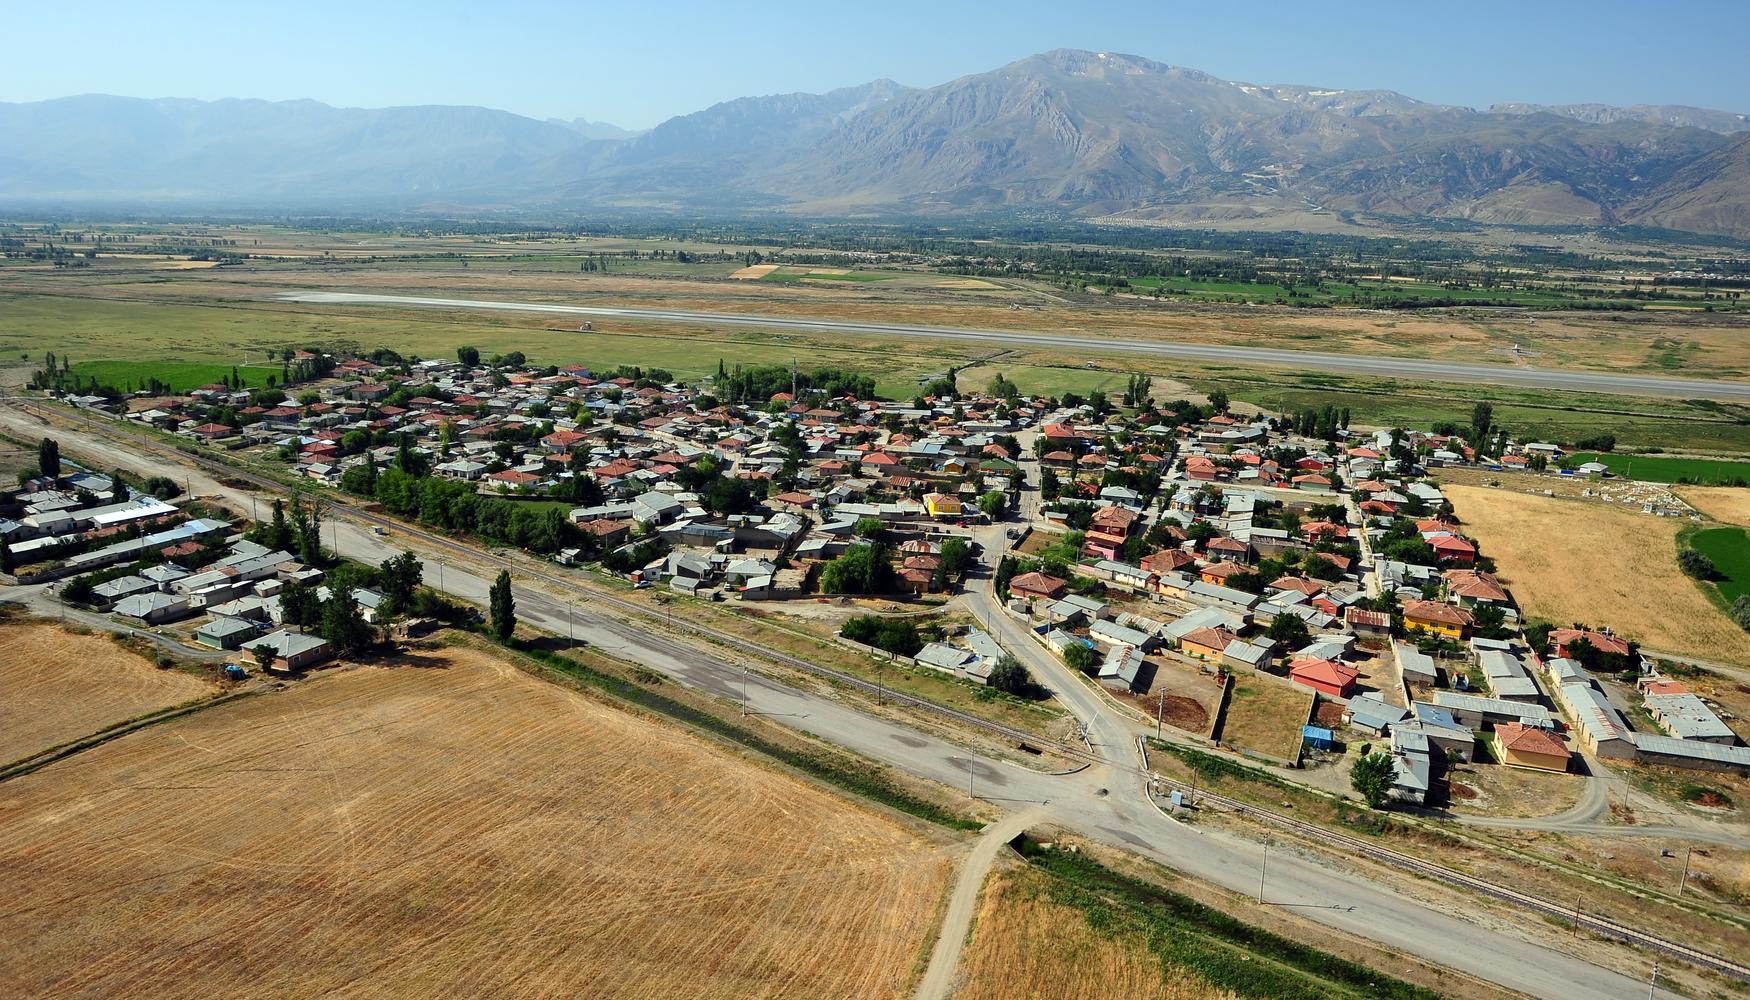 Alquiler de coches en Aeropuerto Erzincan